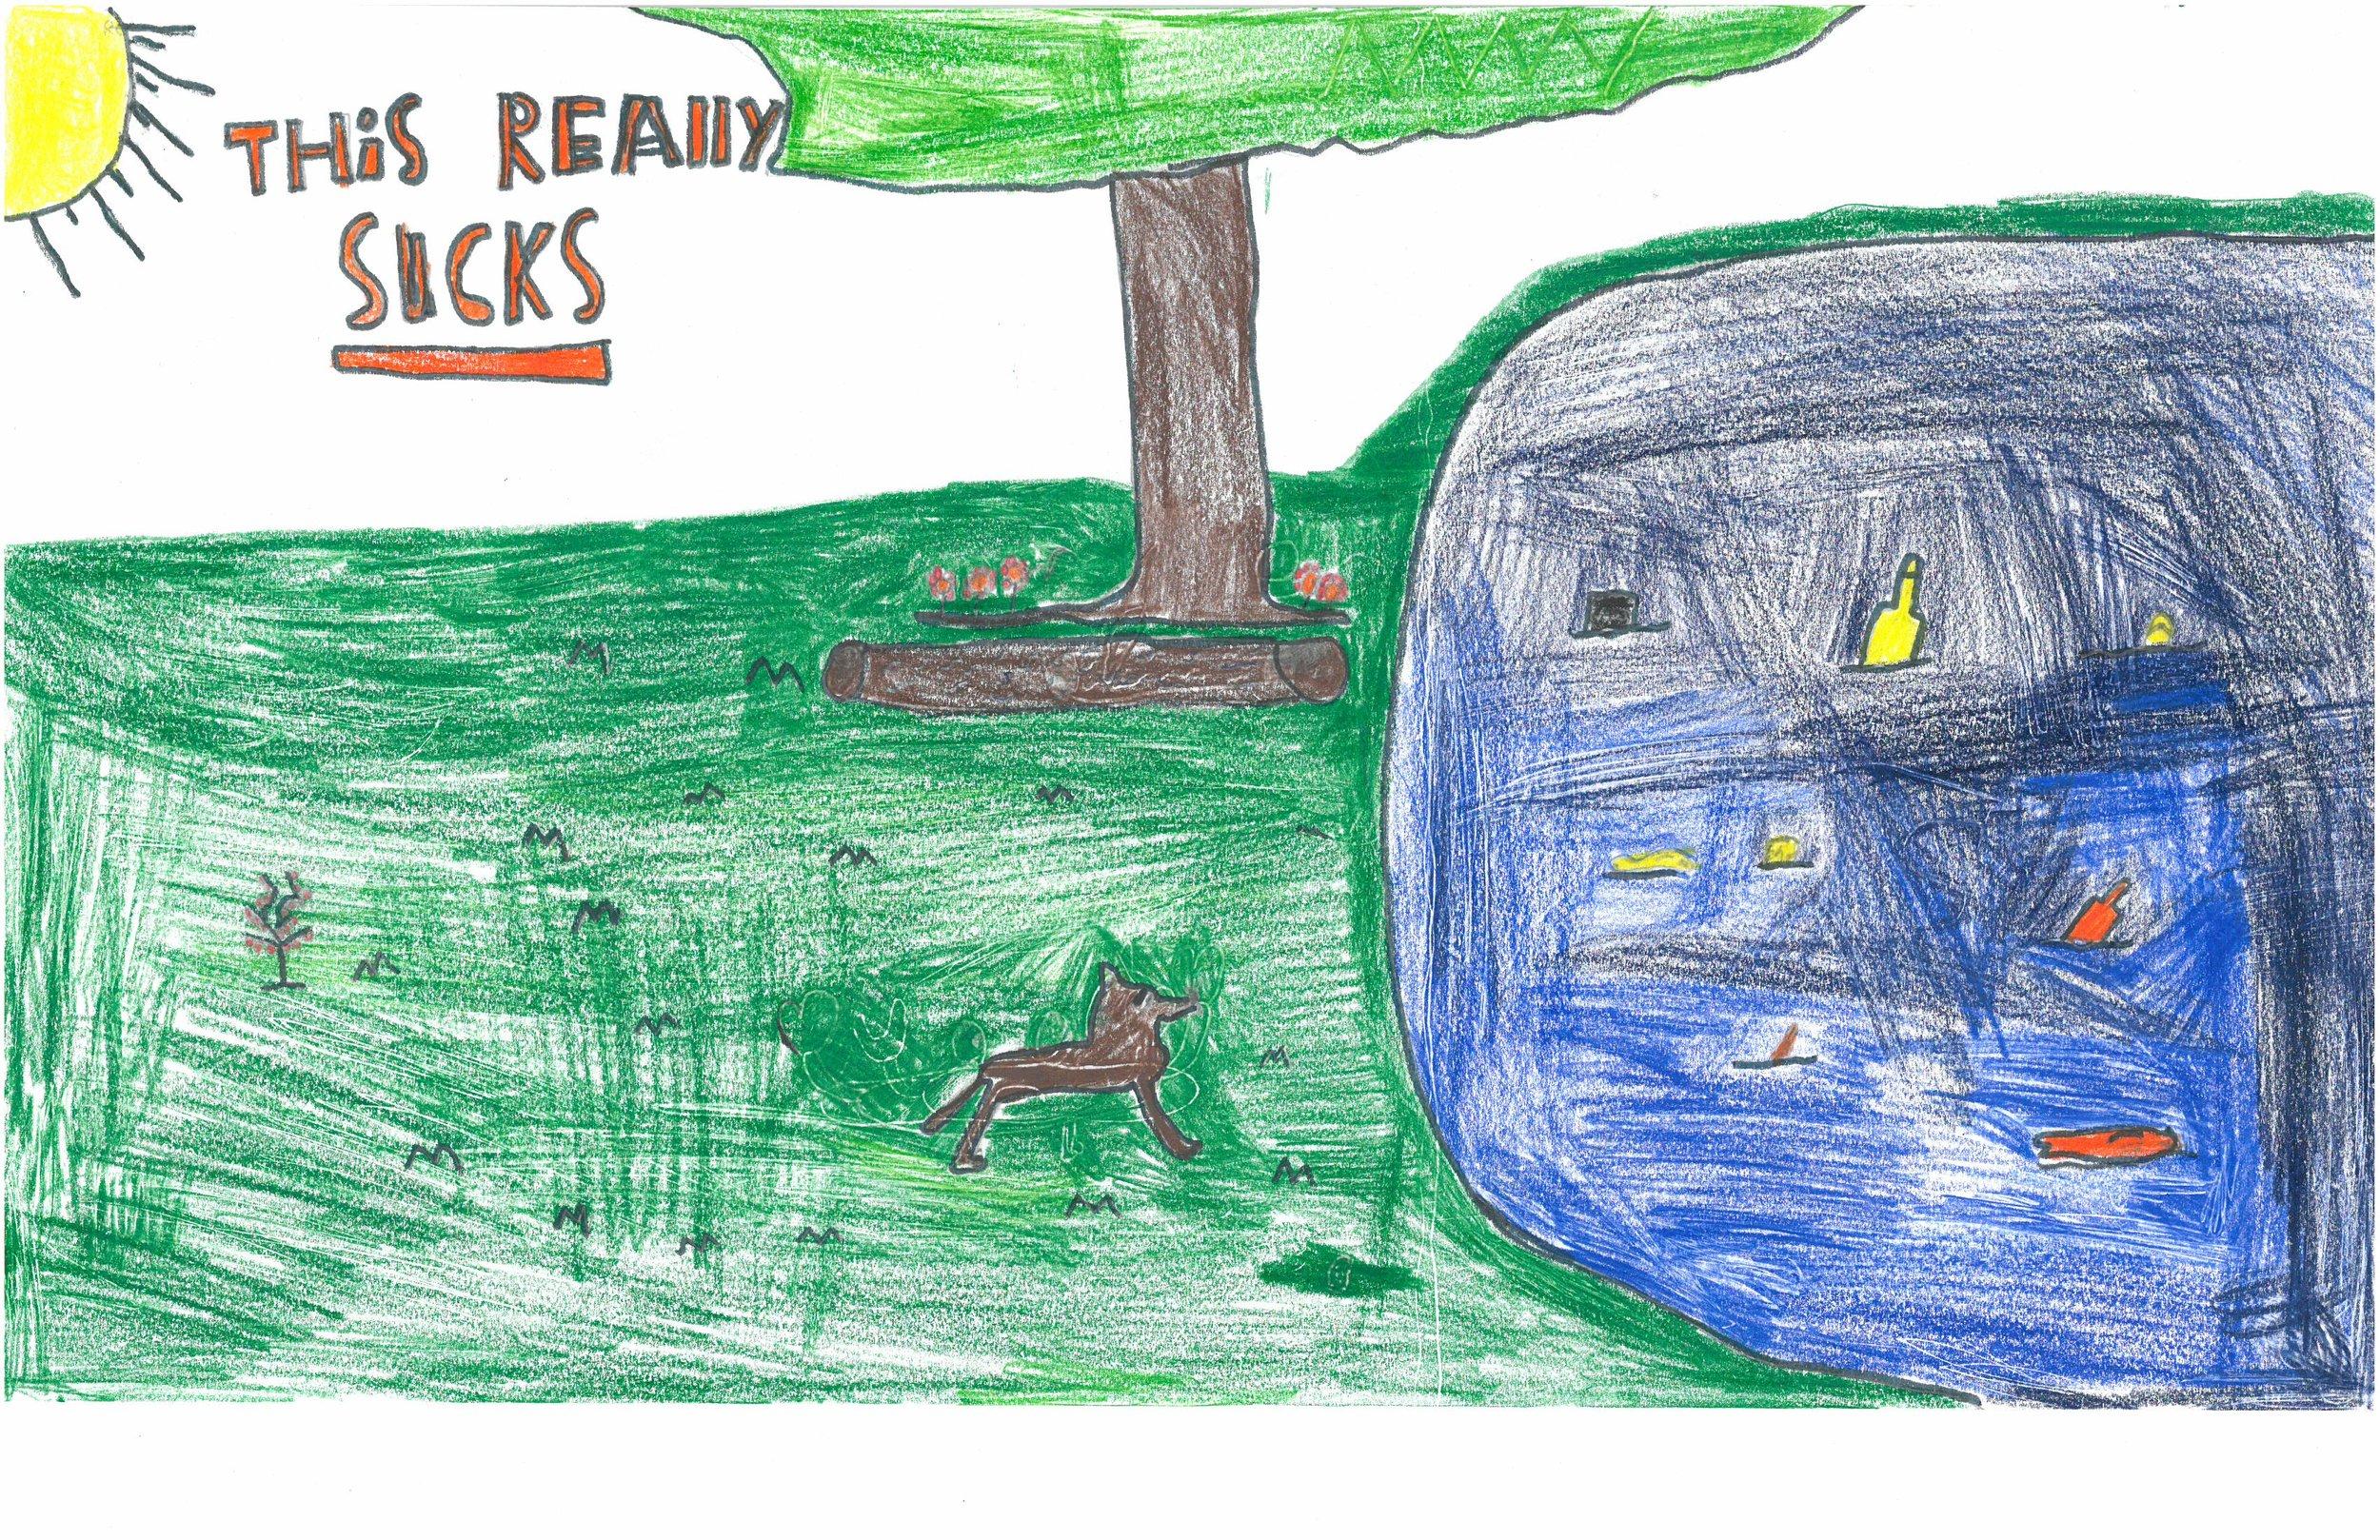 Siarra Ryan, 4th grader at Sharpe Elem.